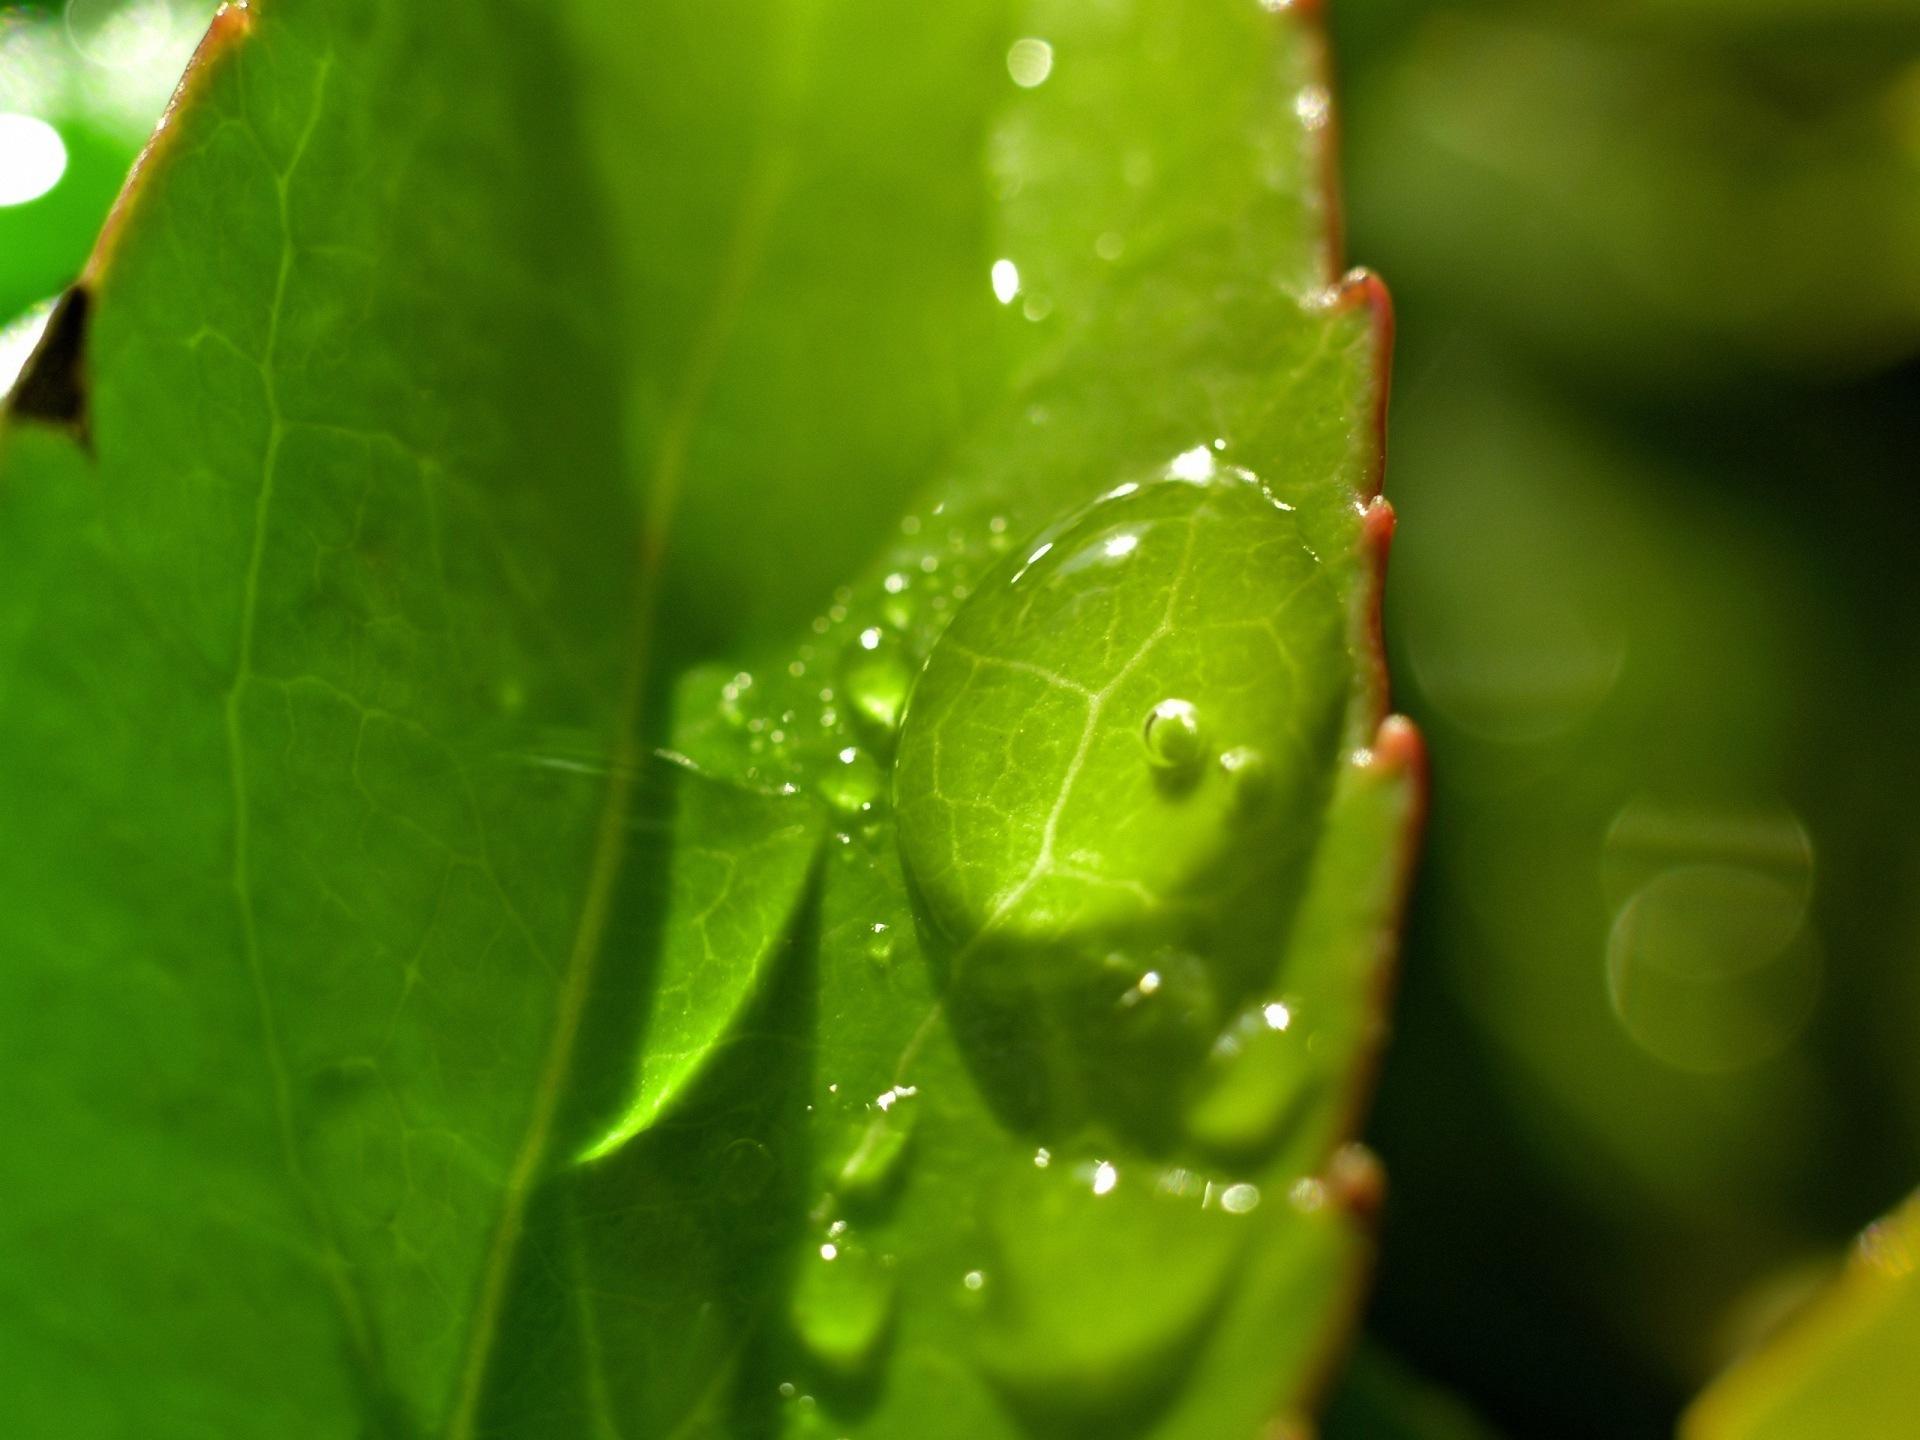 Green Nature Обои